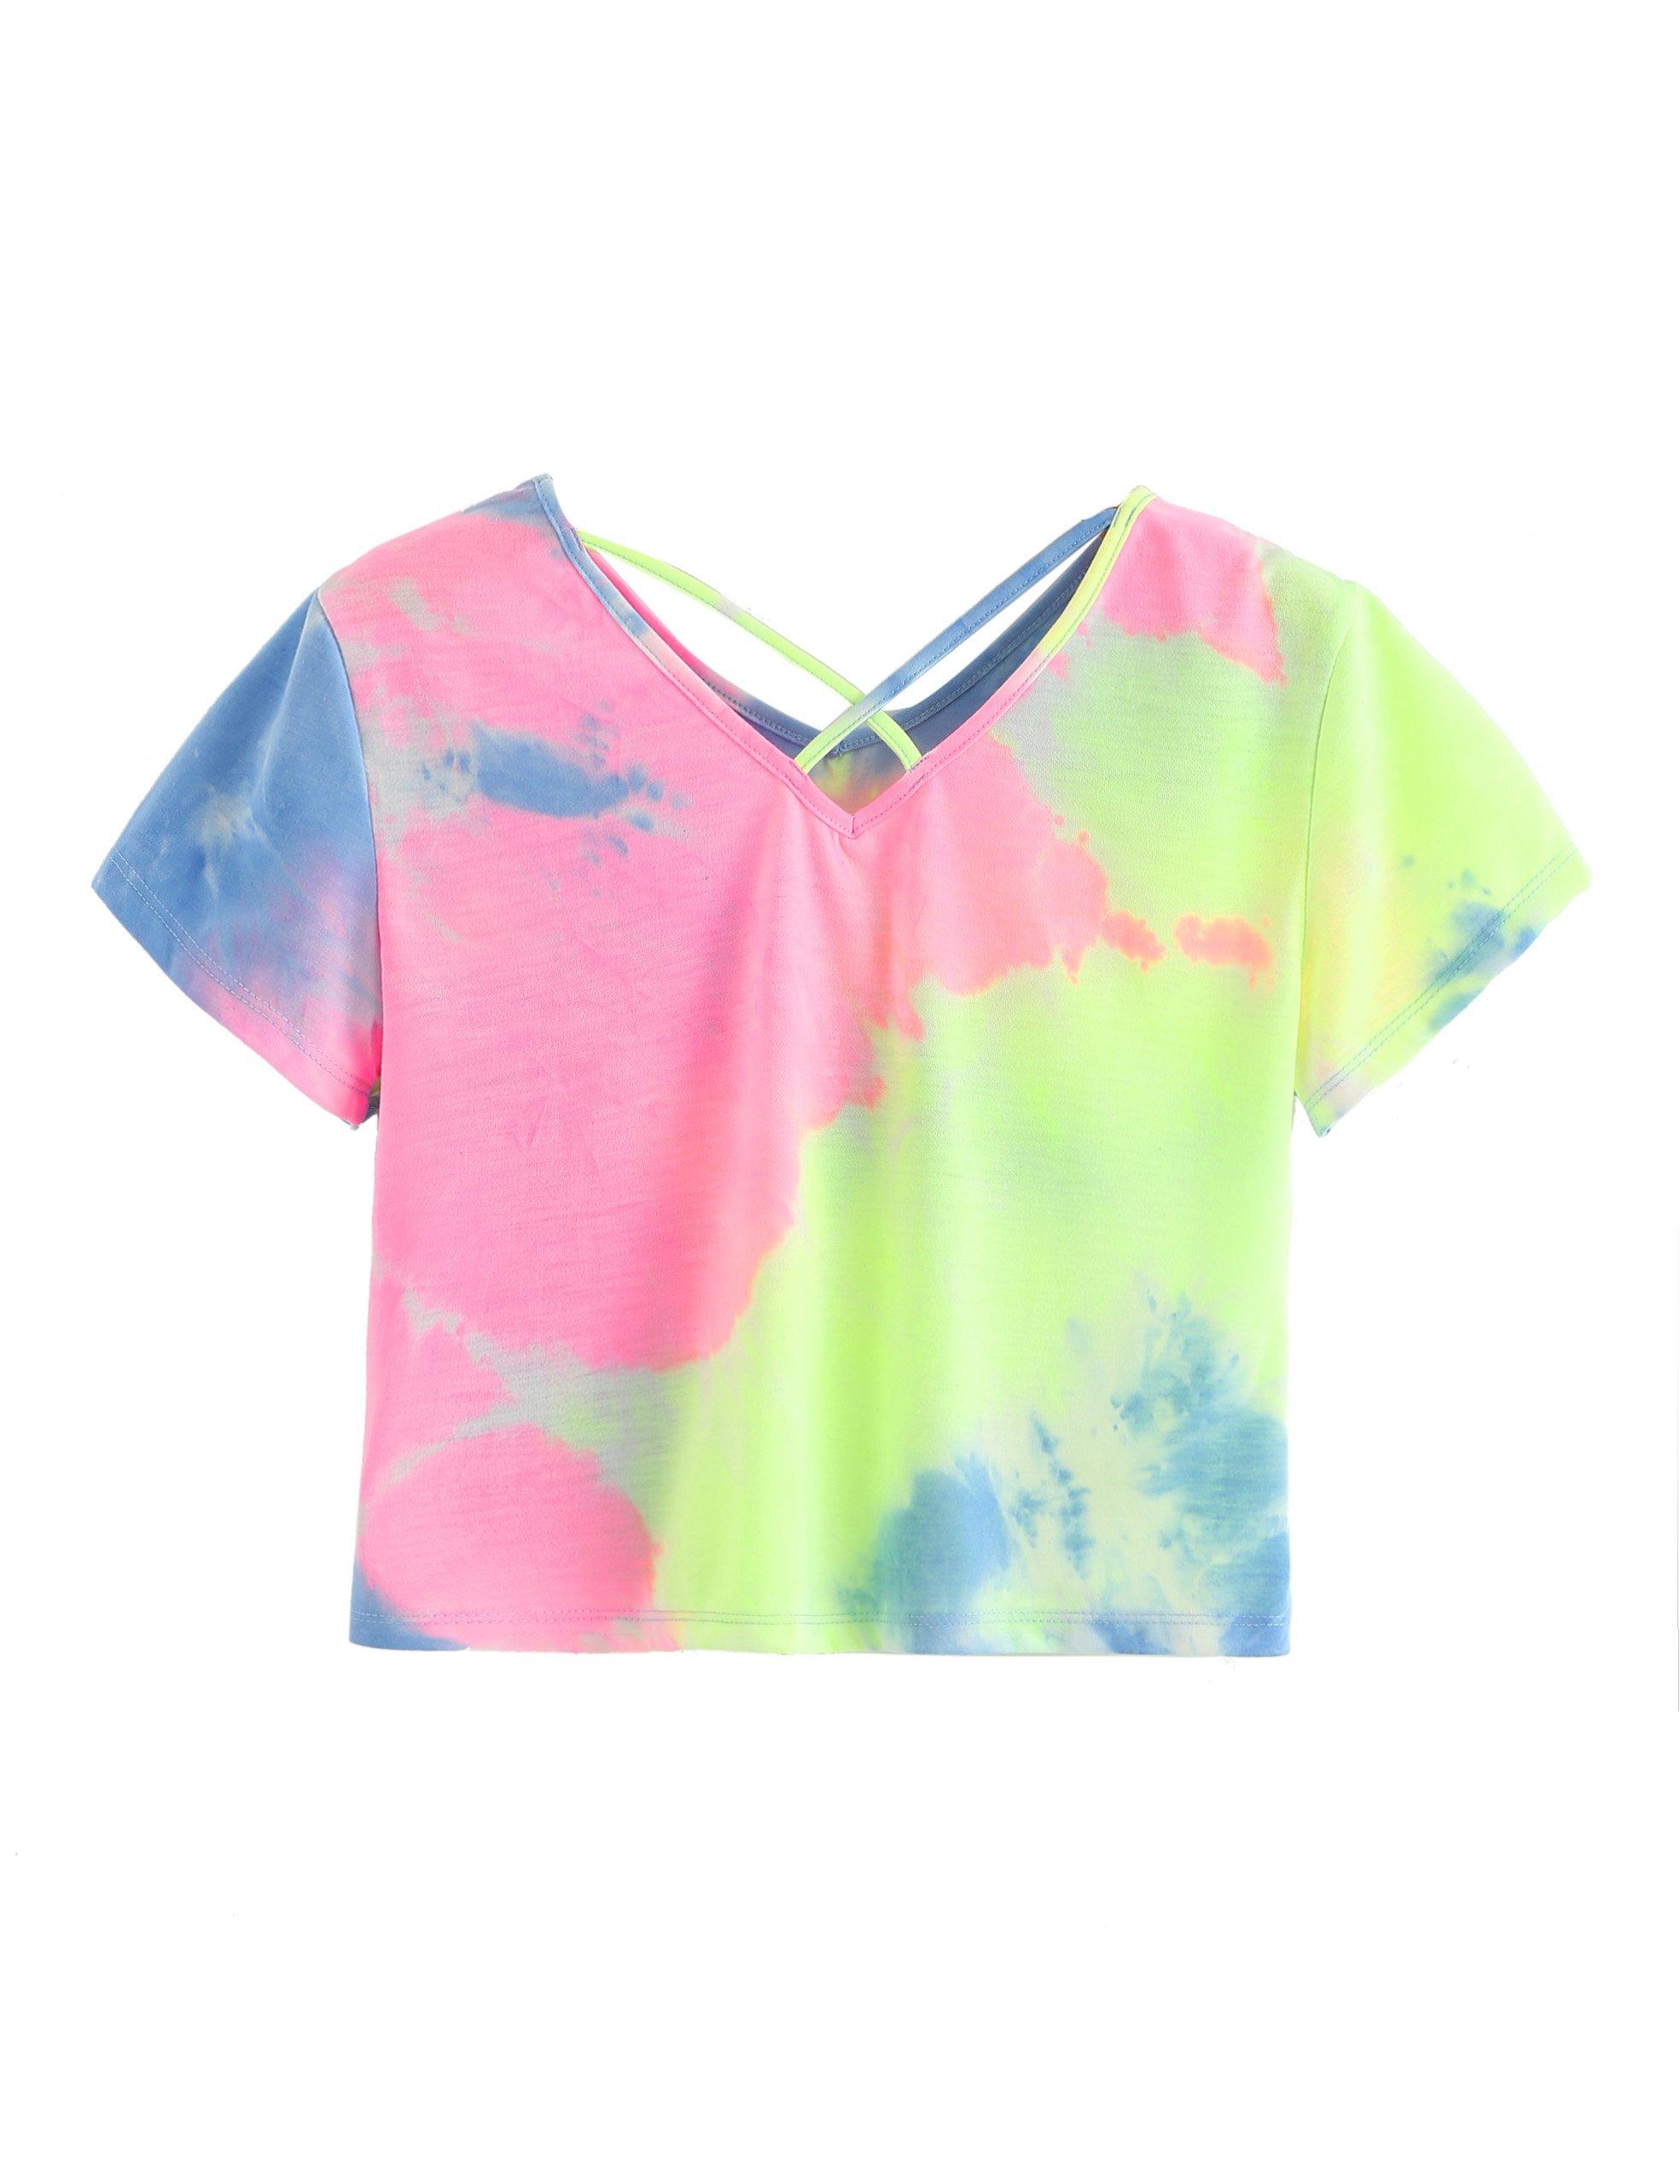 aafff53bbce6b SweatyRocks Women s Tie Dye Criss Cross Back Short Sleeve Crop Summer T  Shirt   Knits   Tees   Clothing